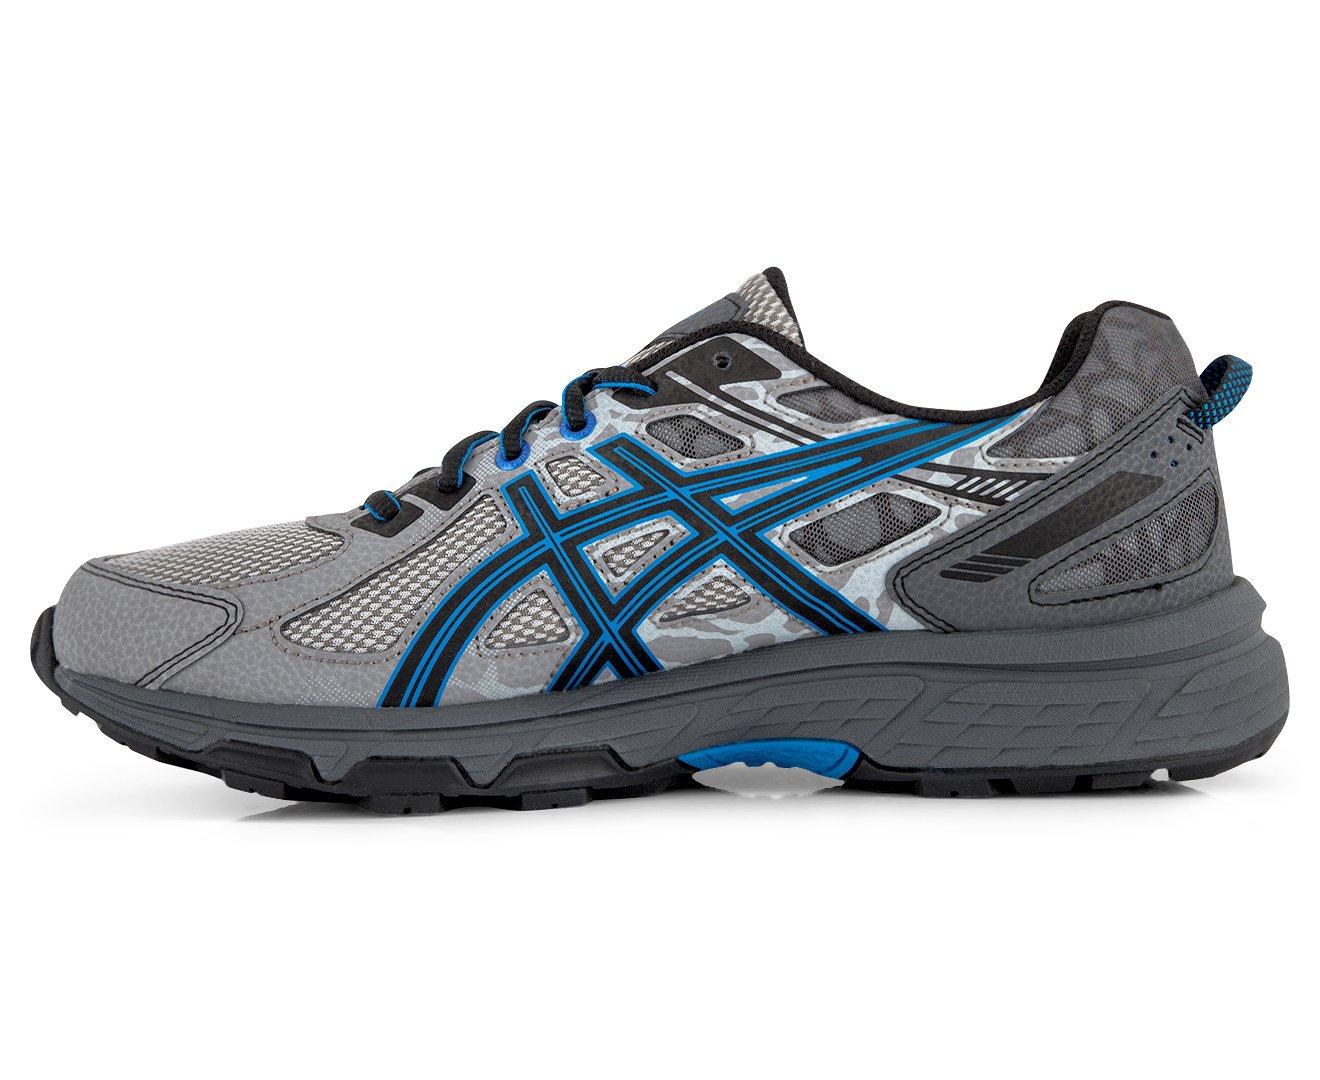 ASICS Mens Gel-Venture 6 Running Shoe, Aluminum/Black/Directoire Blue, 12.5 by ASICS